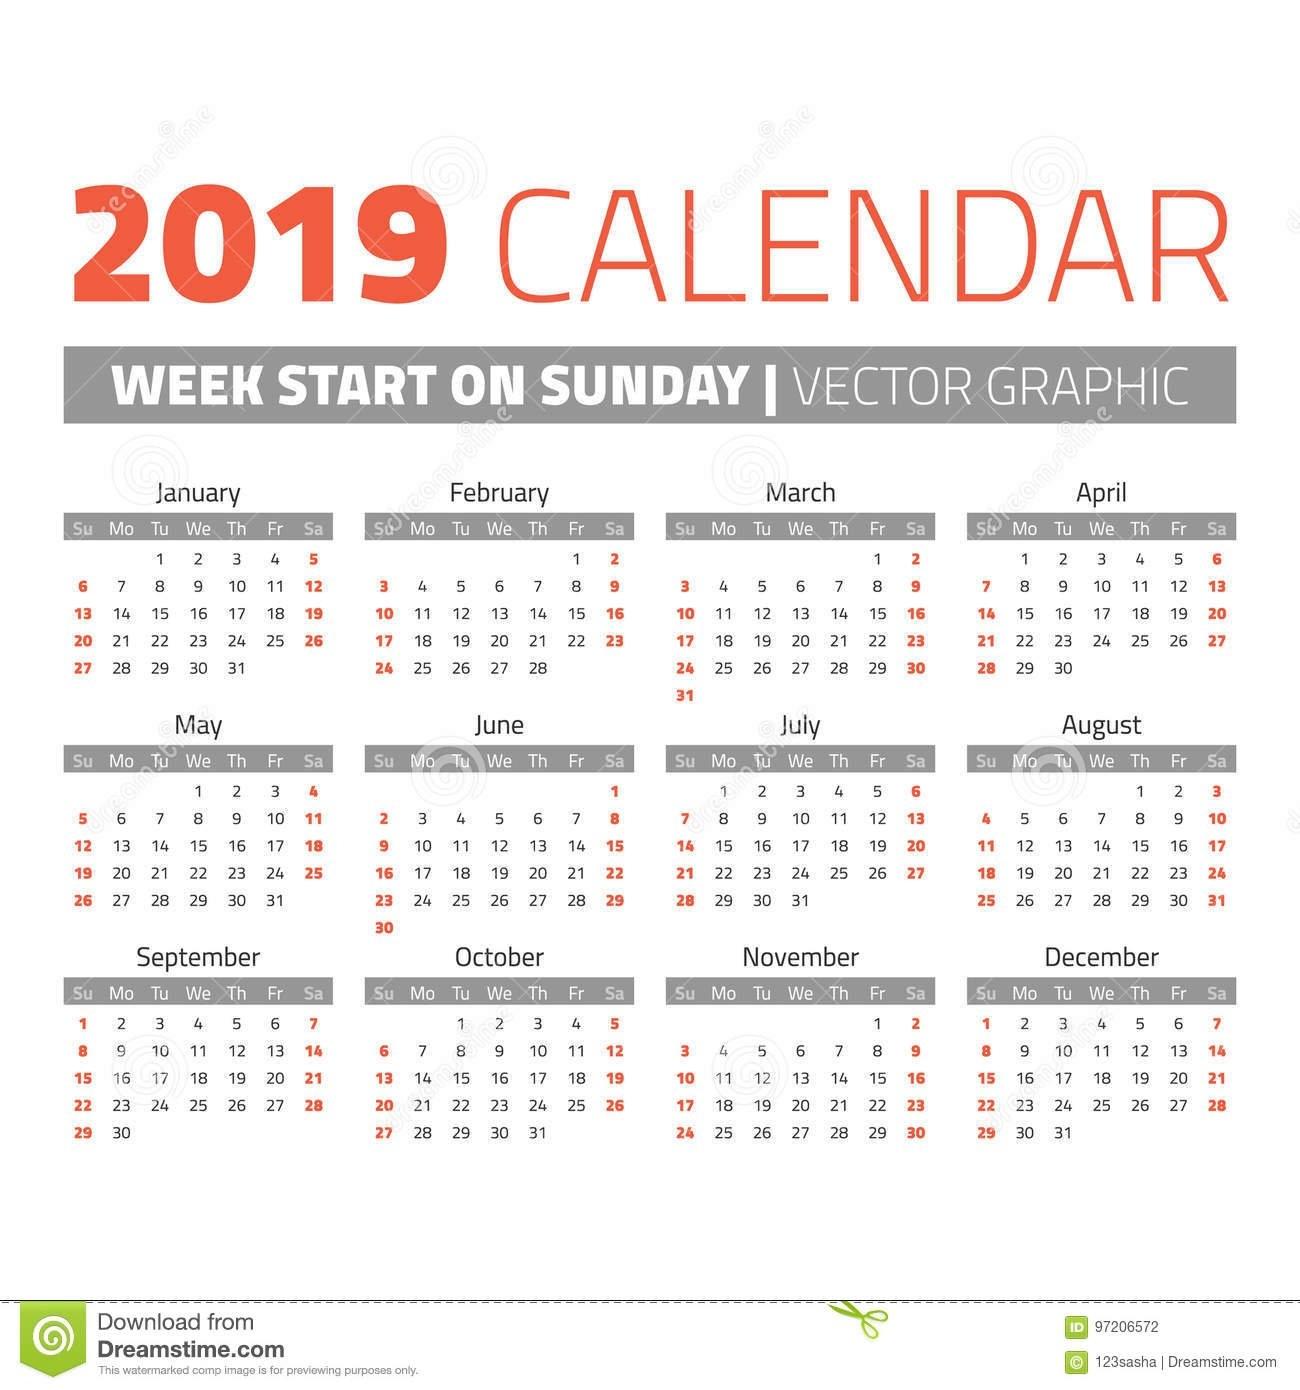 Simple 2019 Year Calendar Stock Vector. Illustration Of Date - 97206572 Calendar Week 16 2019